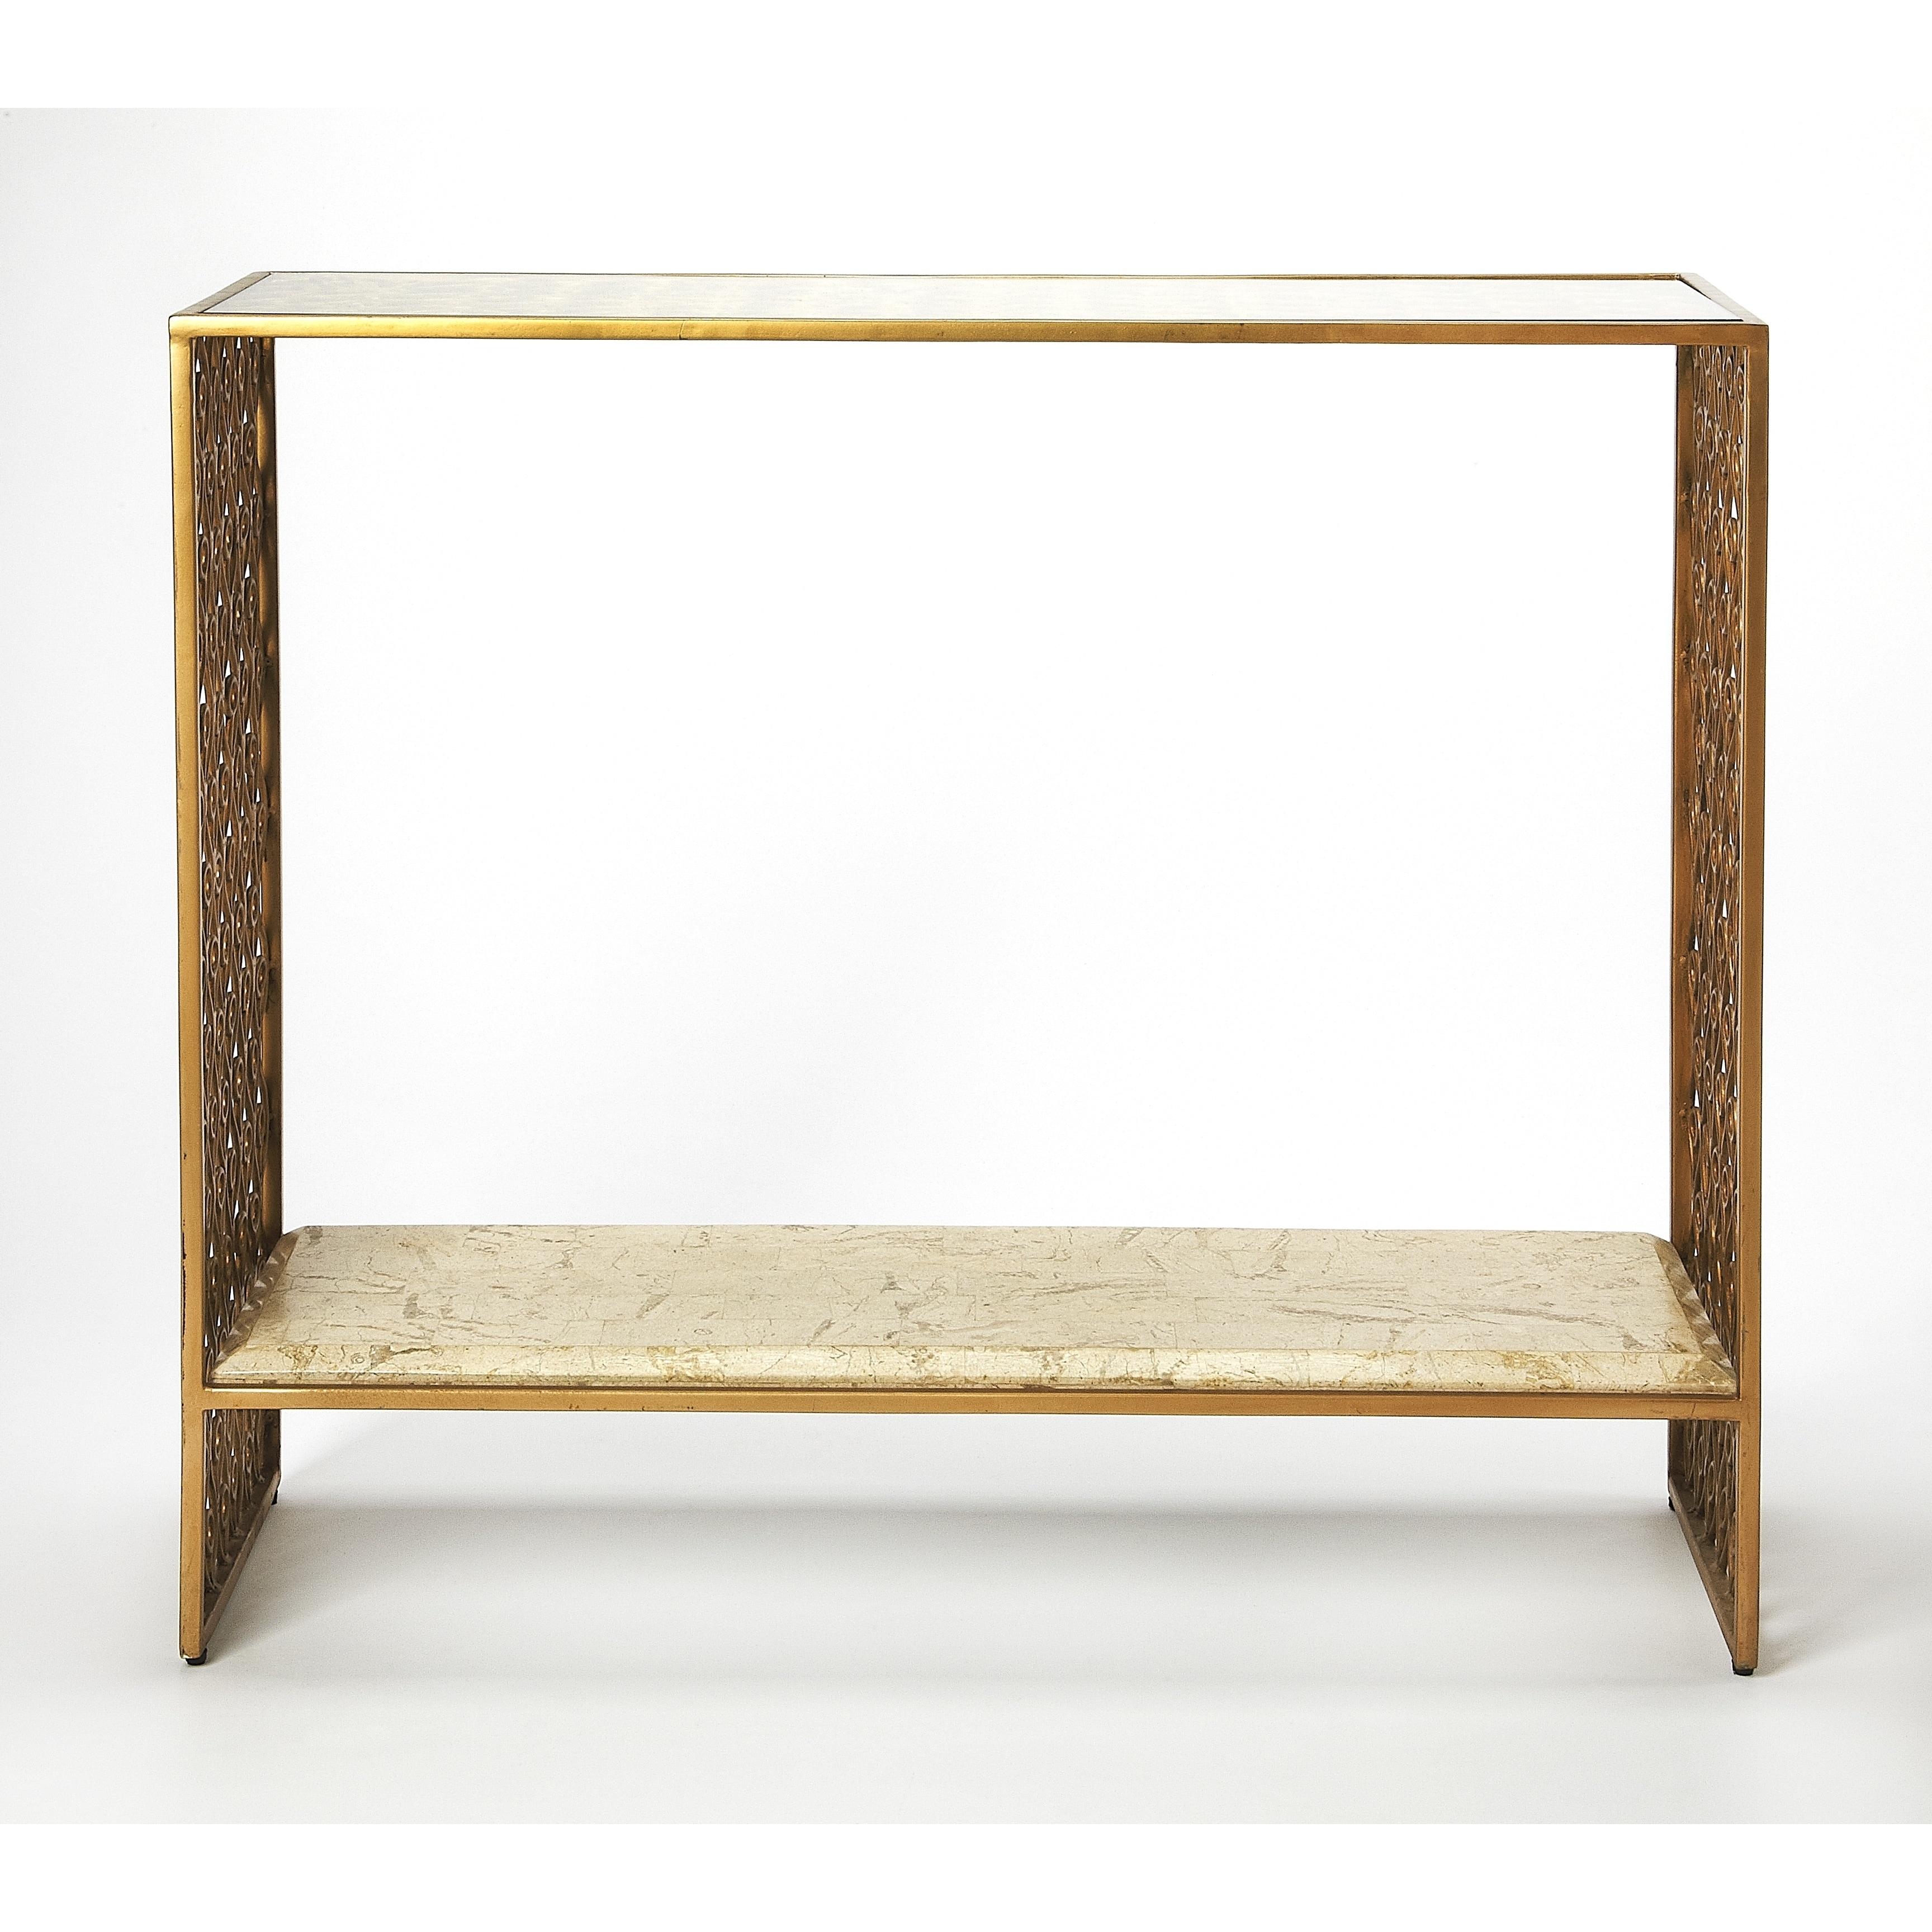 Fabulous Butler Cambria Transitional Fossil Stone And Metal Rectangular Console Table Gold Spiritservingveterans Wood Chair Design Ideas Spiritservingveteransorg